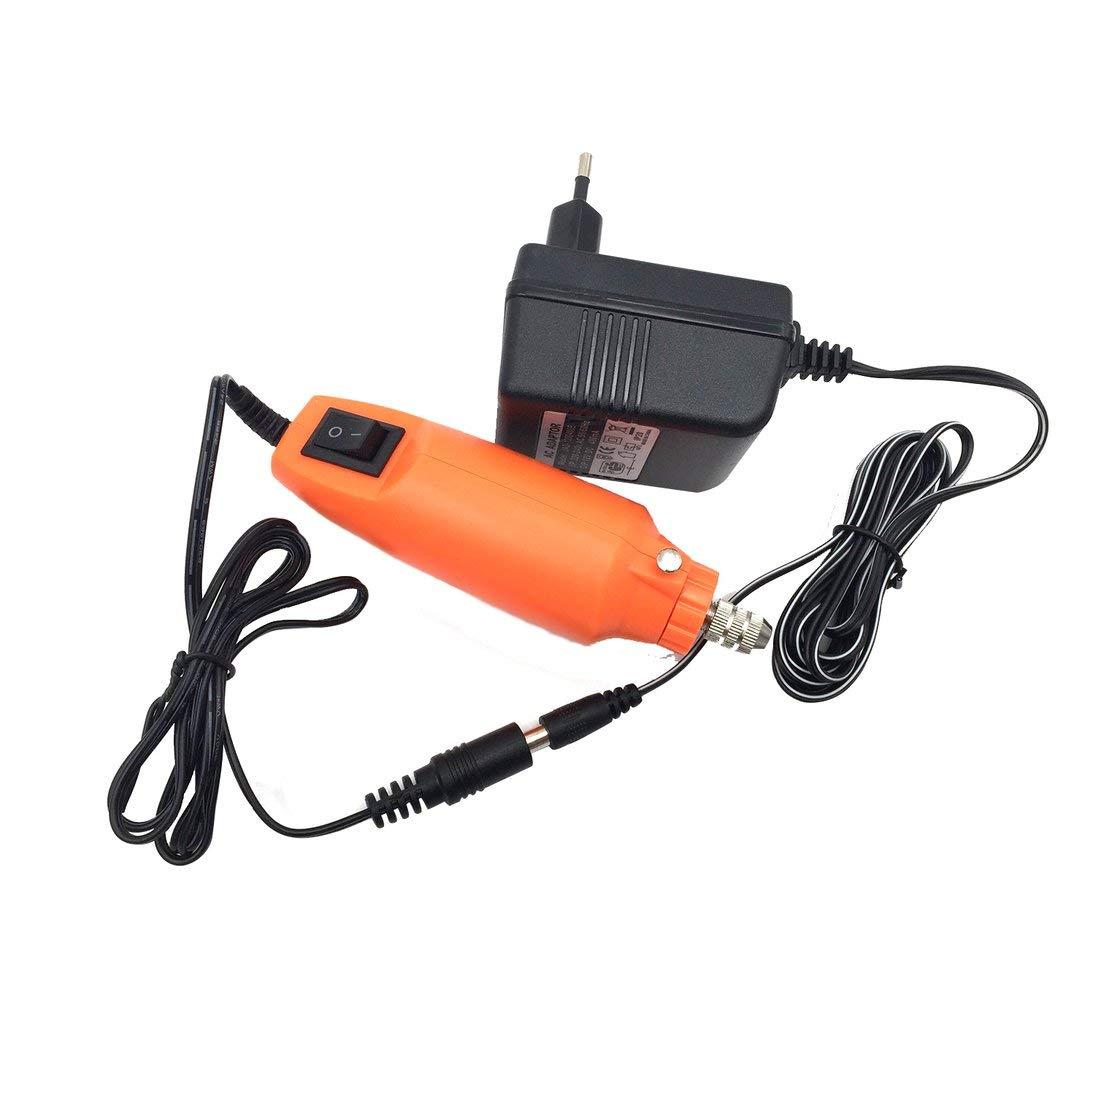 Baynne Electric Grinder Kit,Mini Handle Electric Drill Grinding Machine Engraving Pen Milling Trimming Polishing Drilling Cutting Engraving Tool Kit